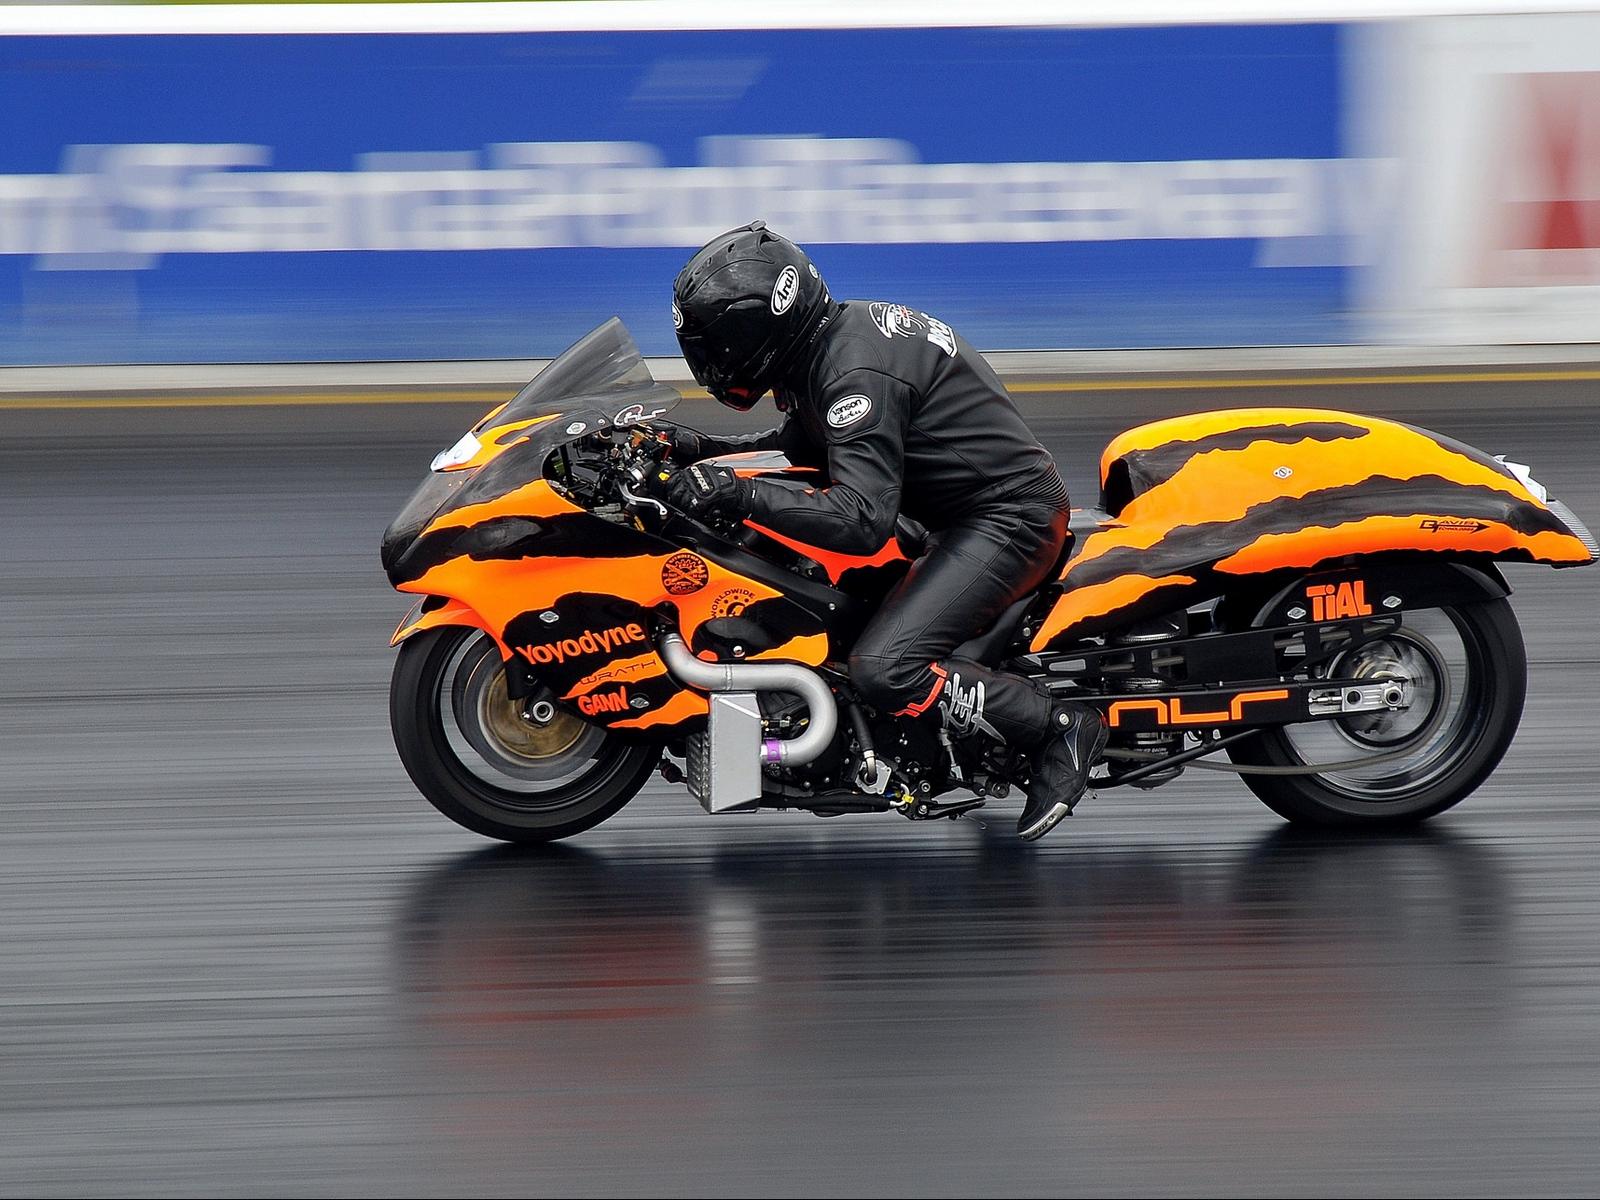 Download wallpaper 1600x1200 motorcycle bike racing sports 1600x1200